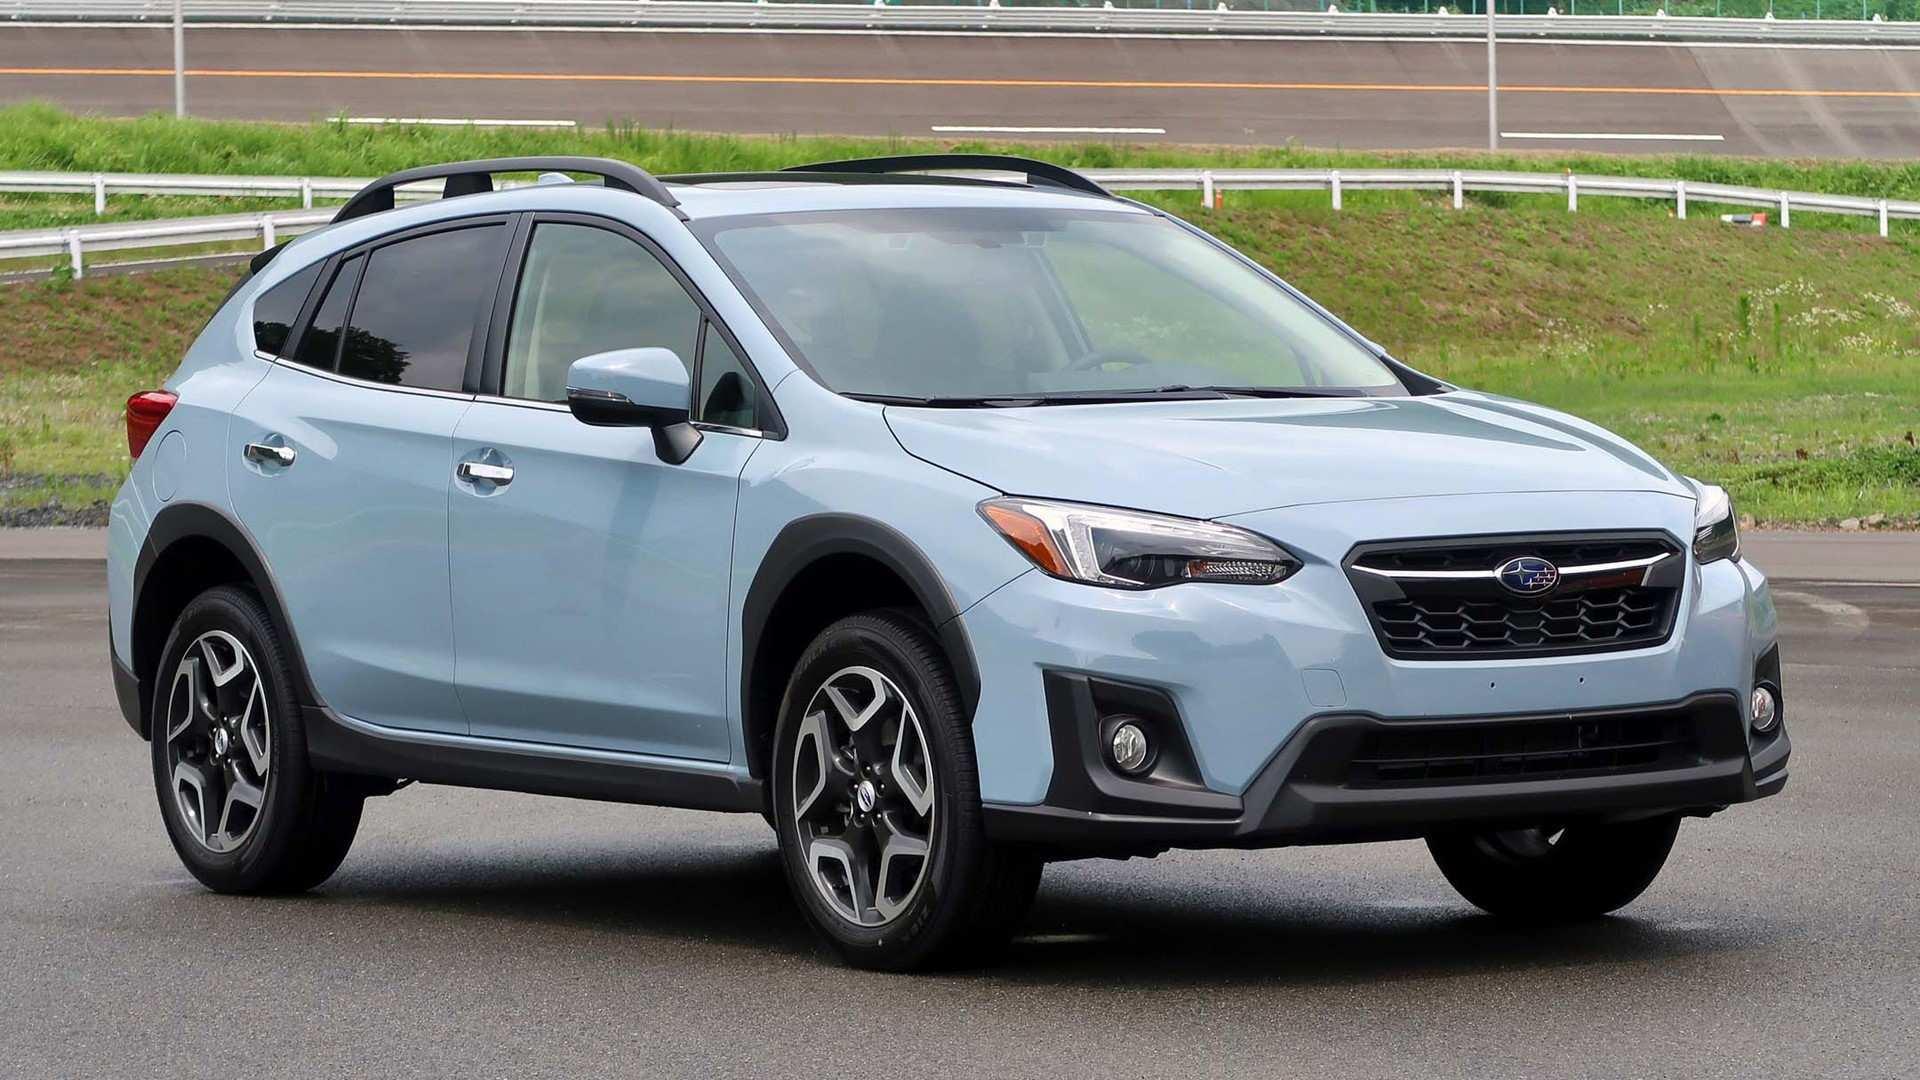 29 Best Review 2020 Subaru Hybrid Reviews with 2020 Subaru Hybrid